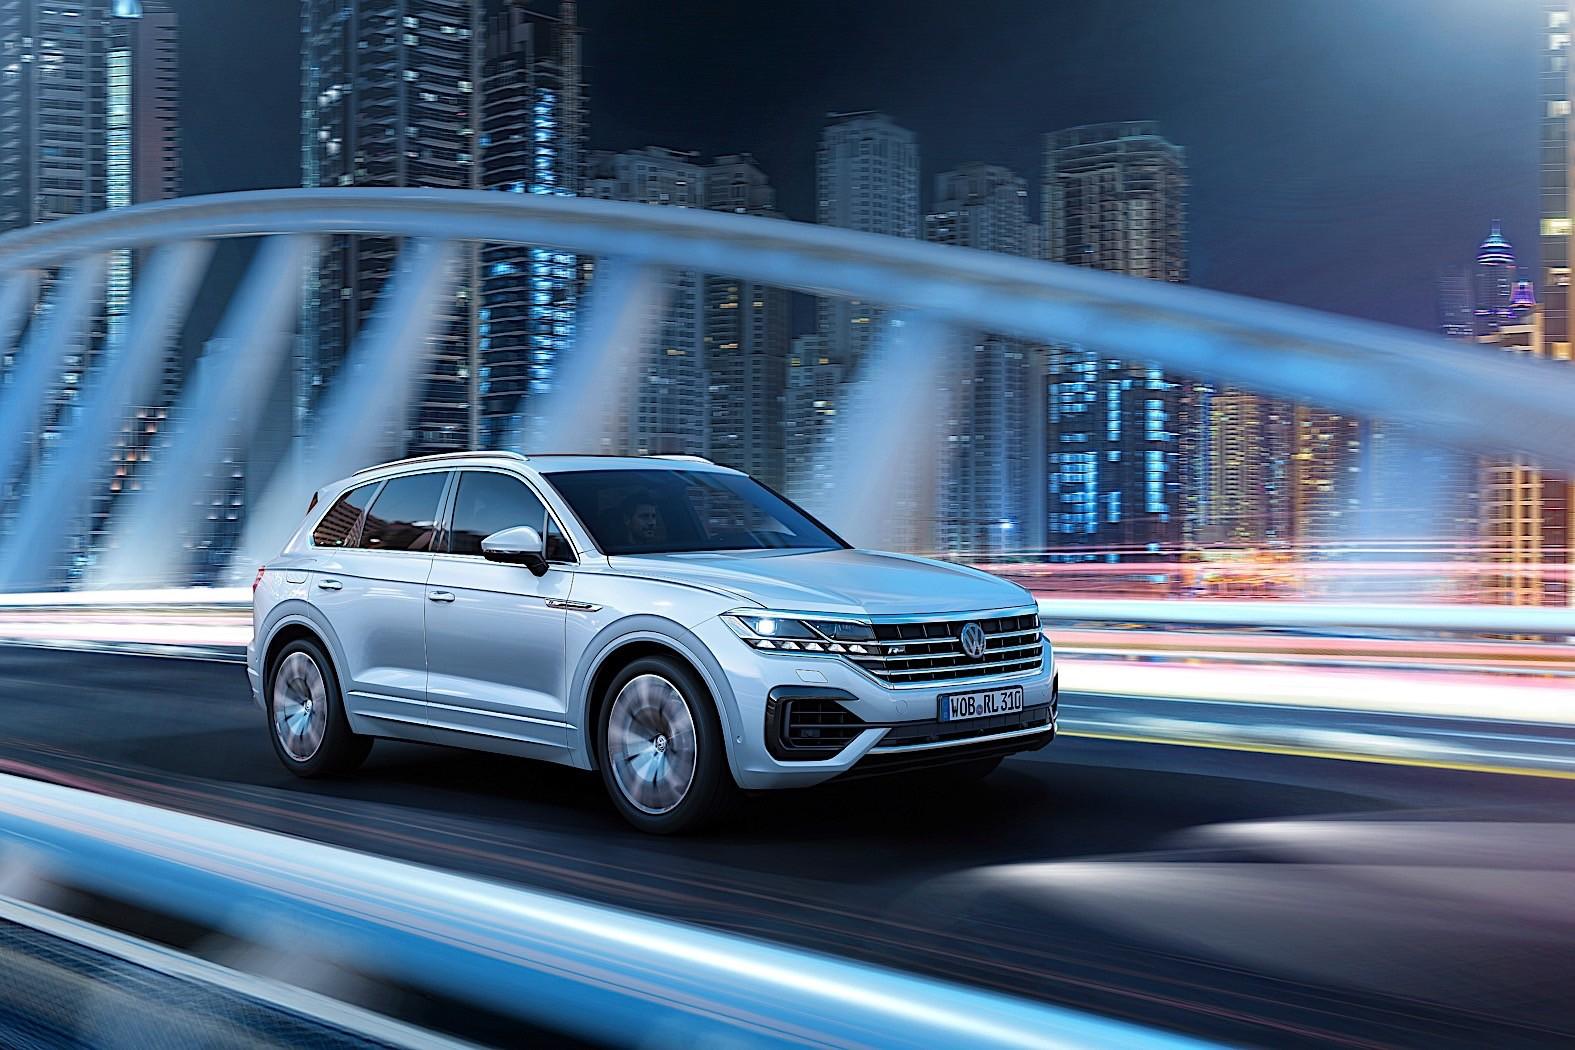 2018 Volkswagen Touareg Breaks Cover in China - autoevolution